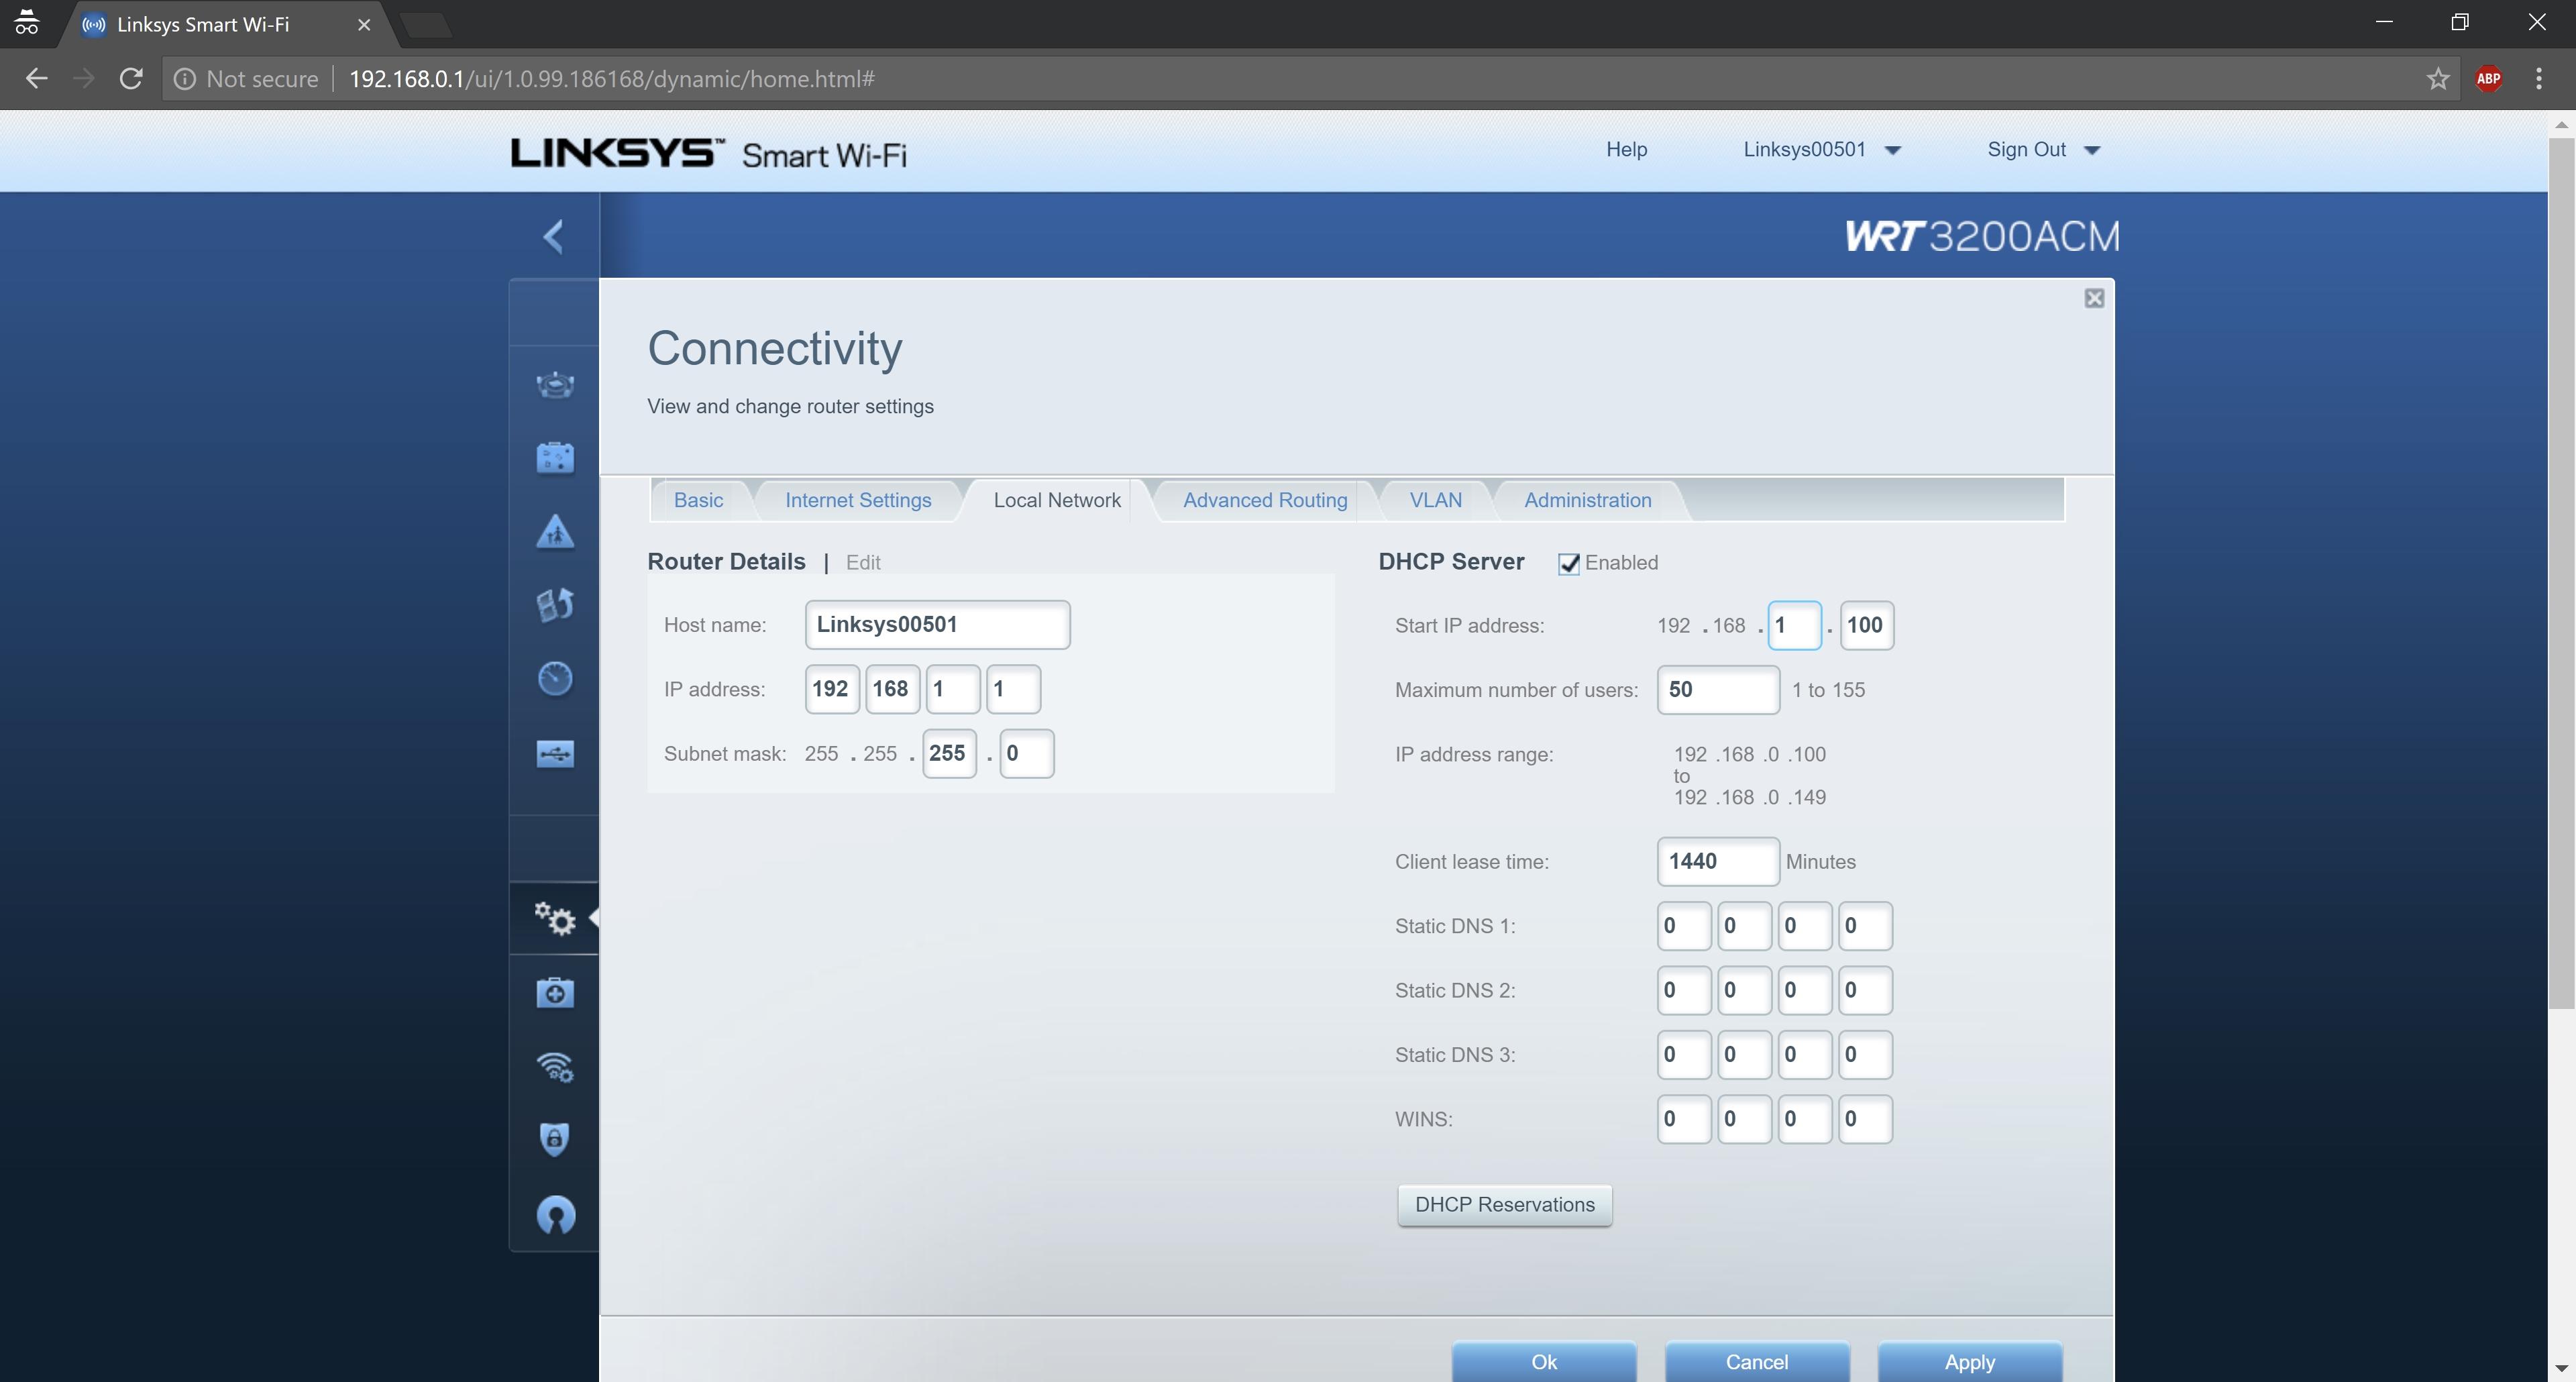 Linksys Ip Address >> Linksys Wireless Router Unexpected Error 2197 Sostechblog Com